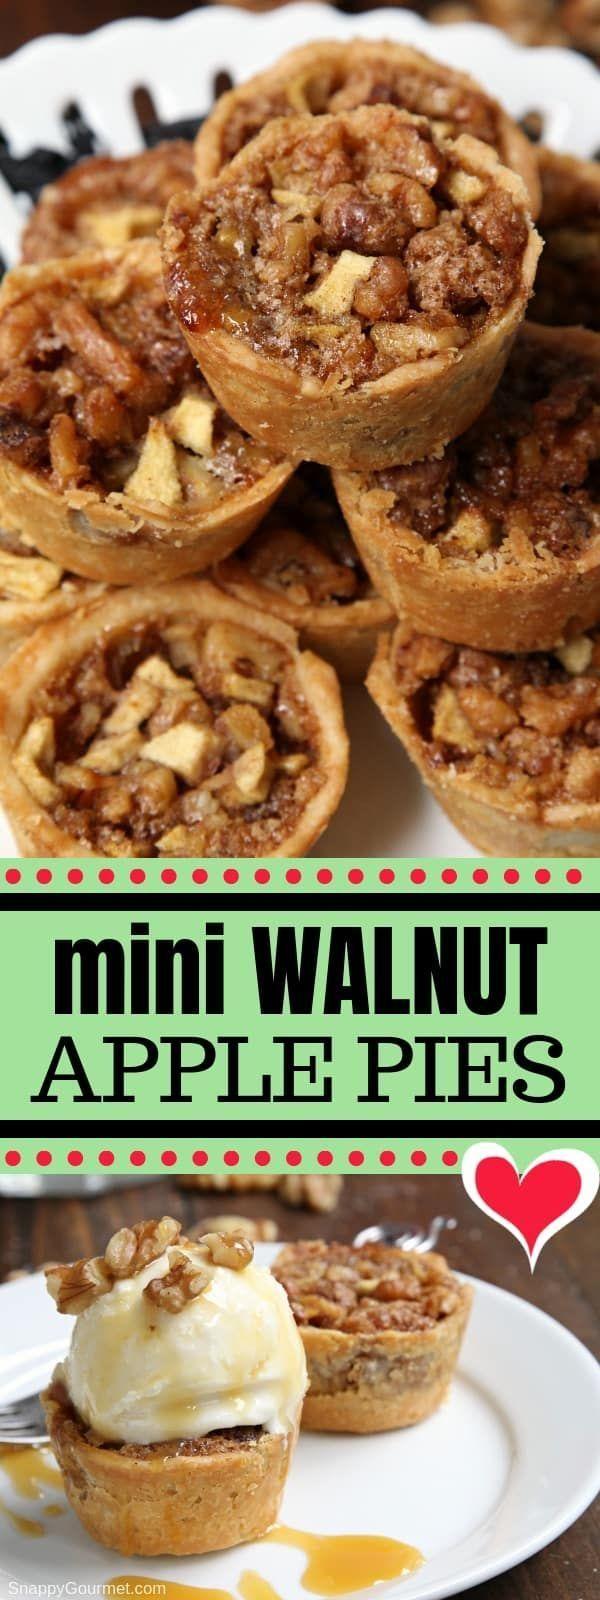 Mini Walnut Apple Pies - easy muffin tin apple pie recipe made in mini muffin pa... - rezepte -